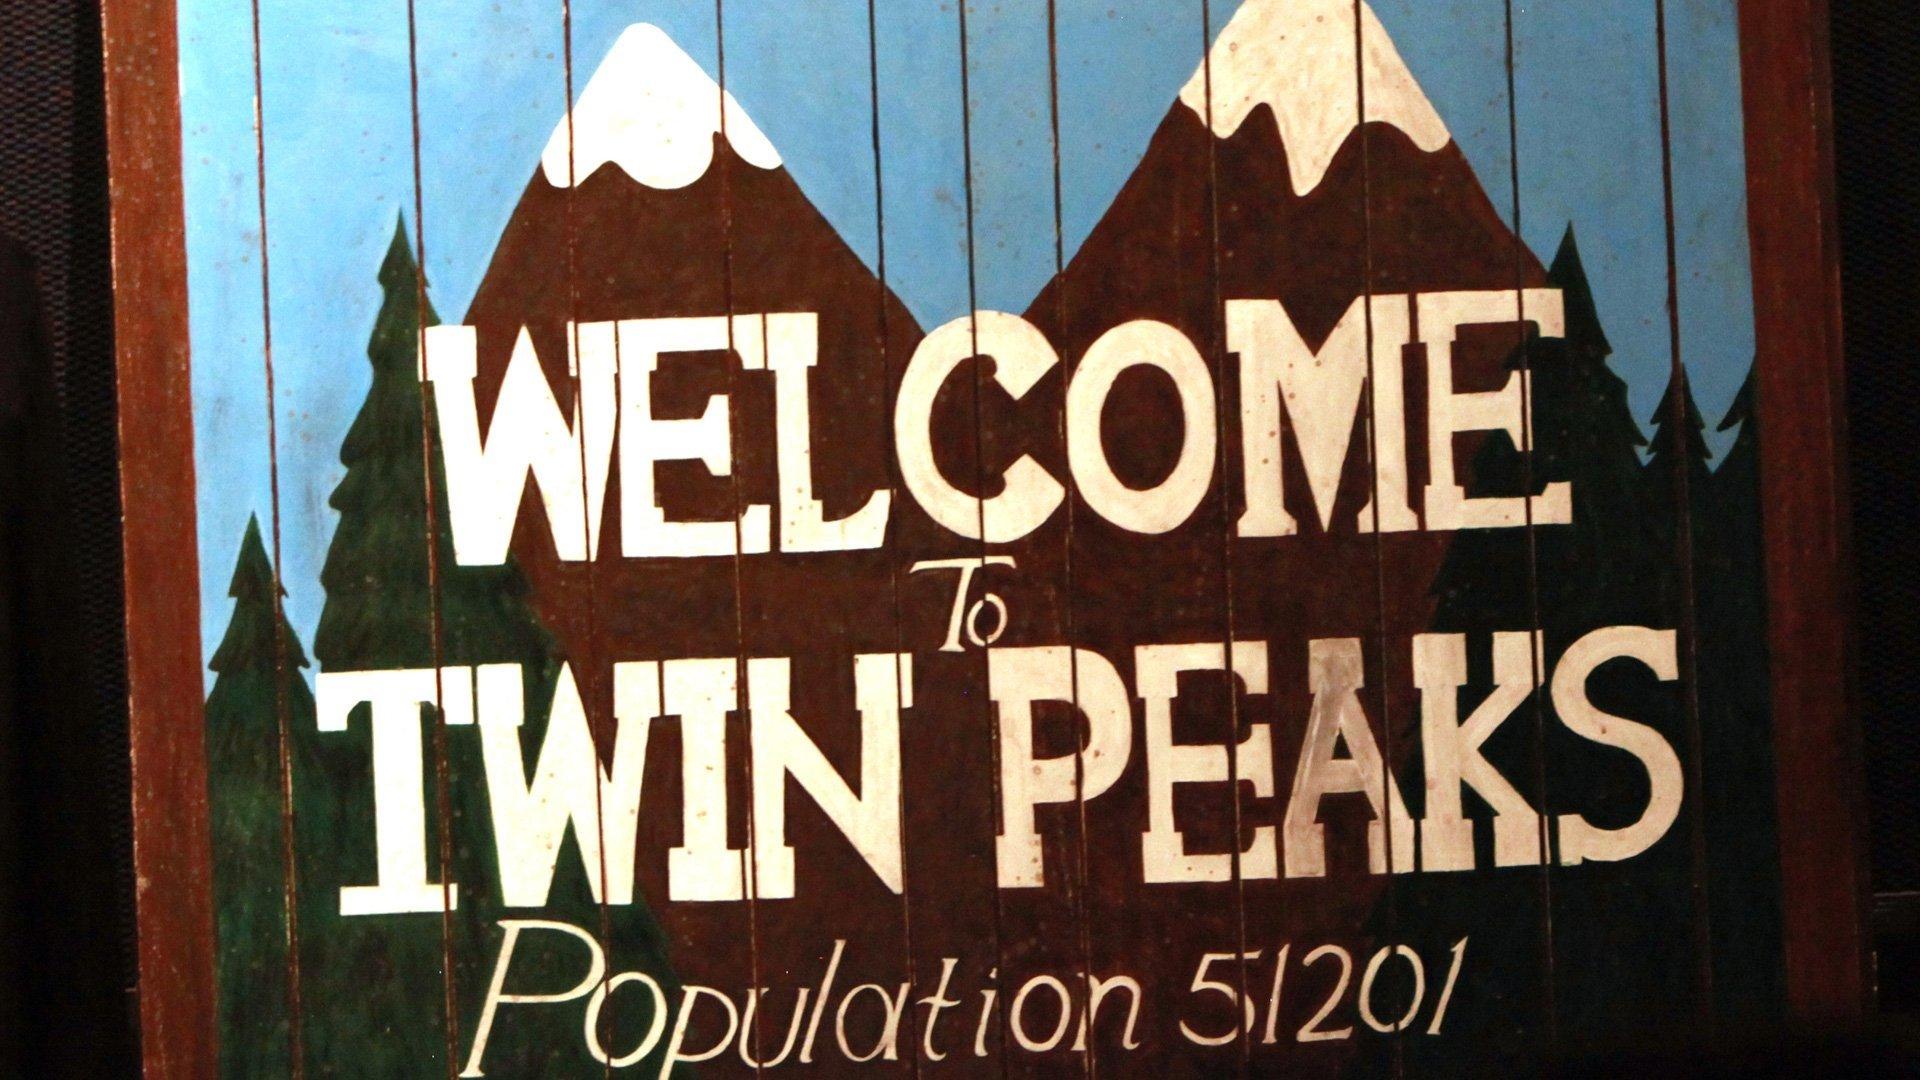 Twin Peaks Hd Wallpaper Background Image 1920x1080 Id